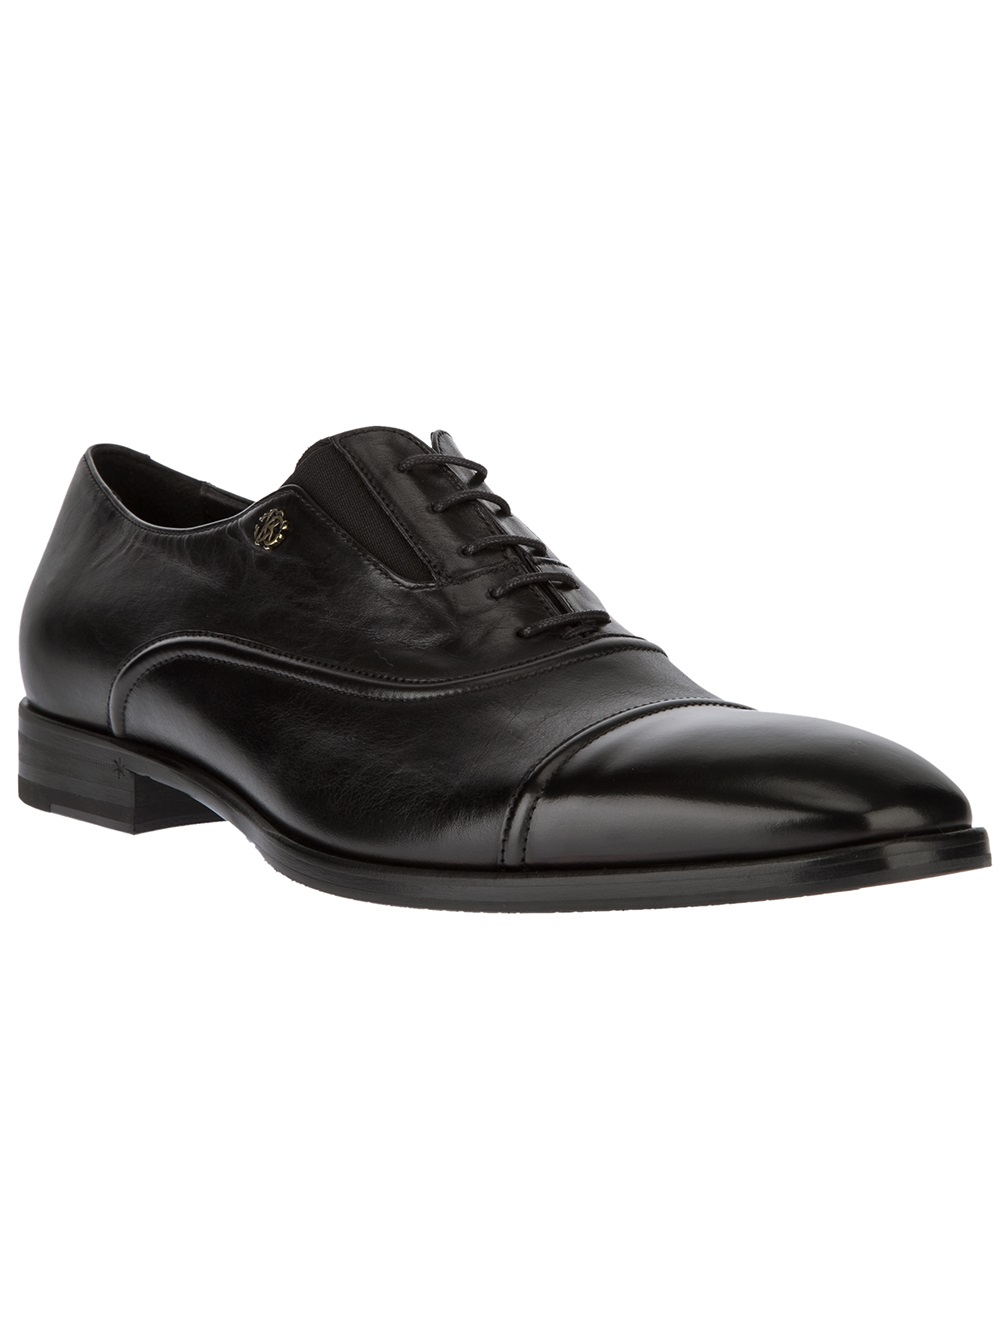 Lyst Roberto Cavalli Oxford Shoe In Black For Men